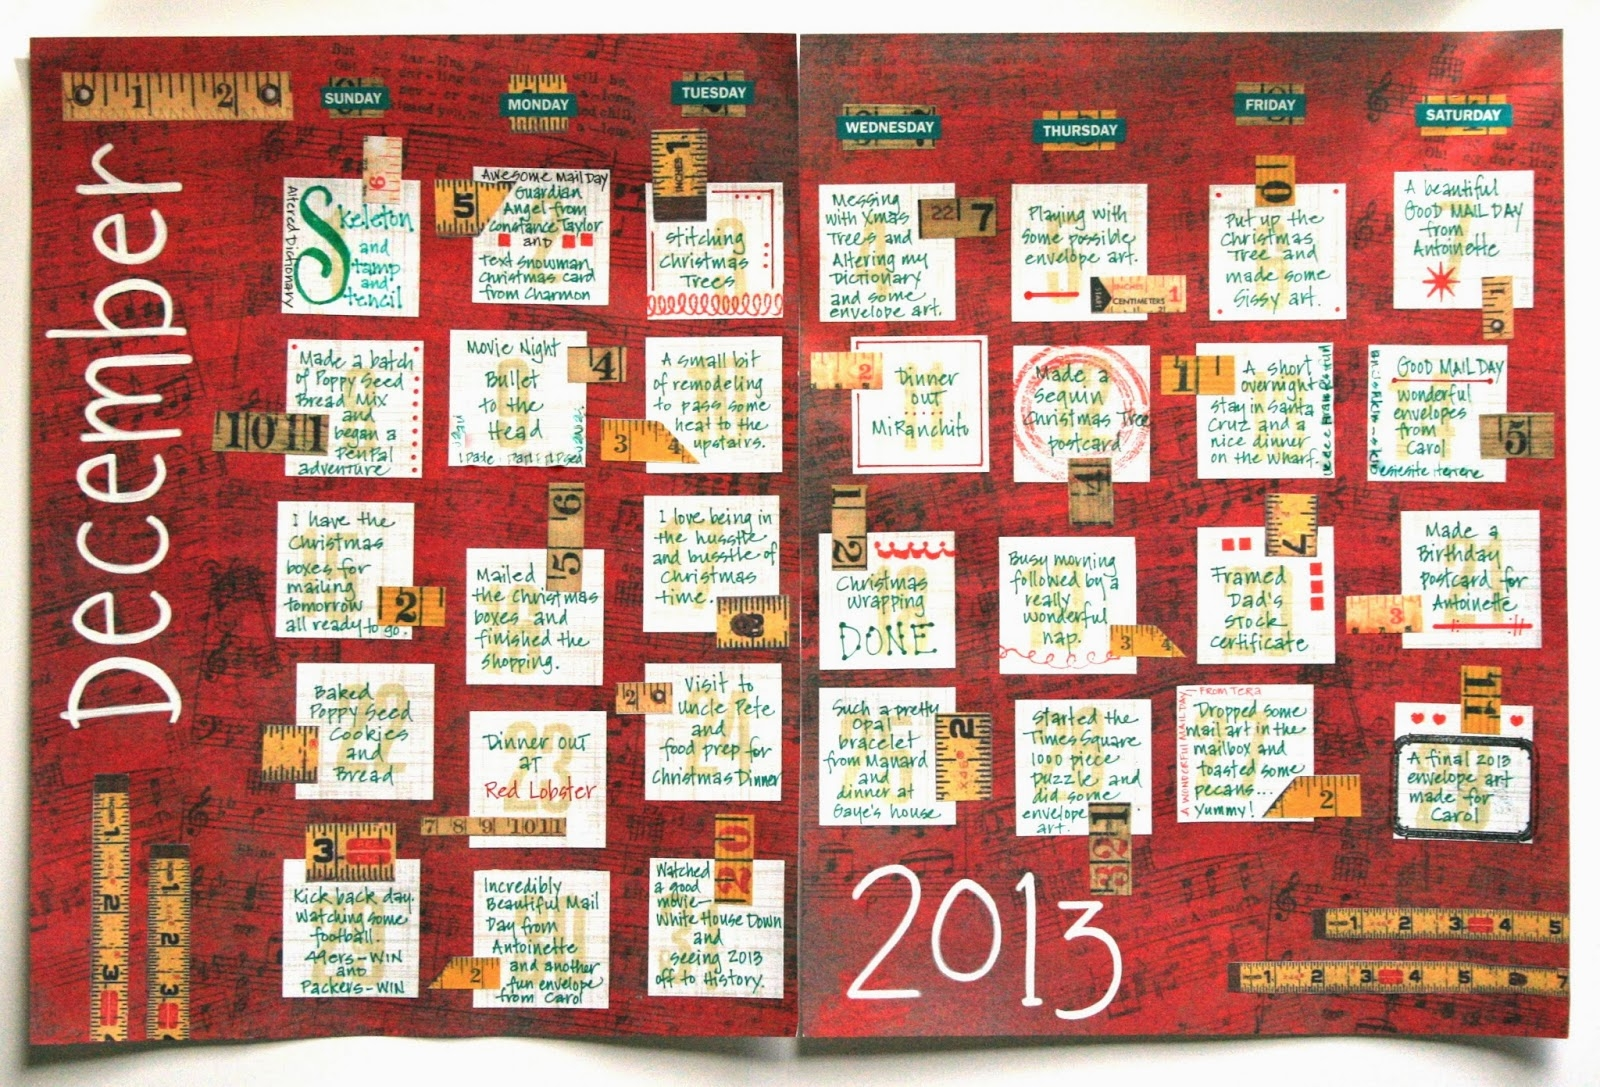 Freezeframe Art Journal Calendar 2013 89uj